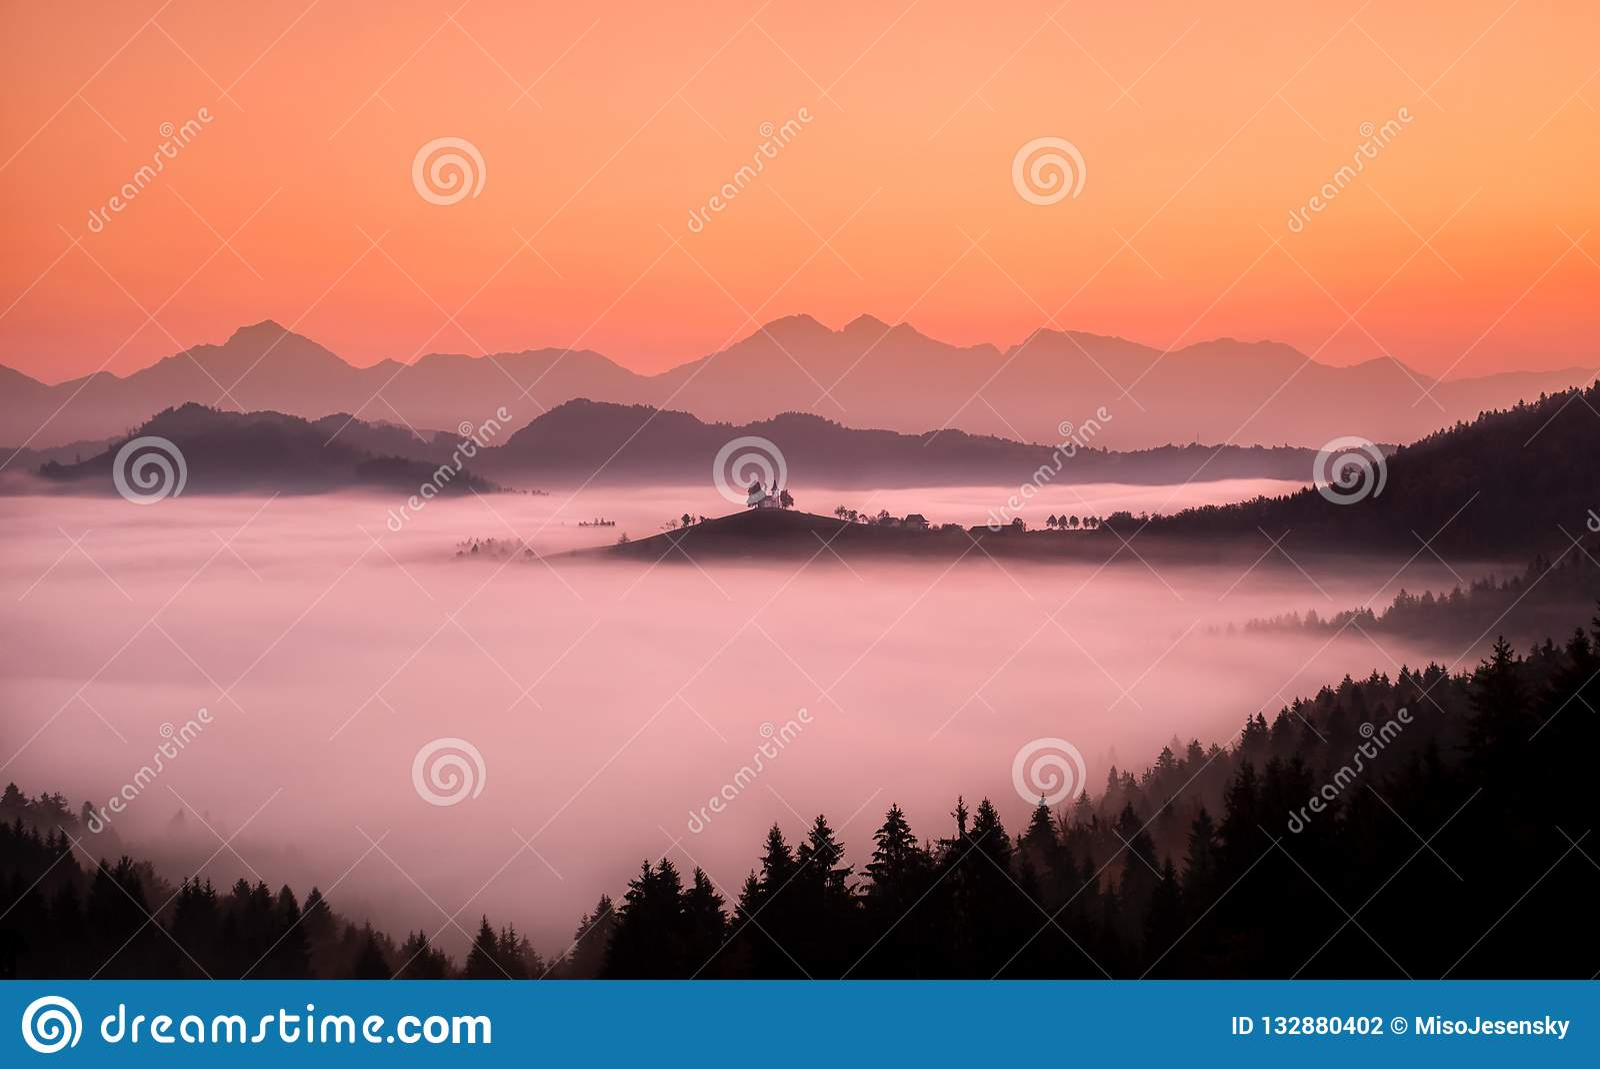 Sveti Tomaz - St. Tomas Slovenia Stock Photo - Image of mist colors: 132880402